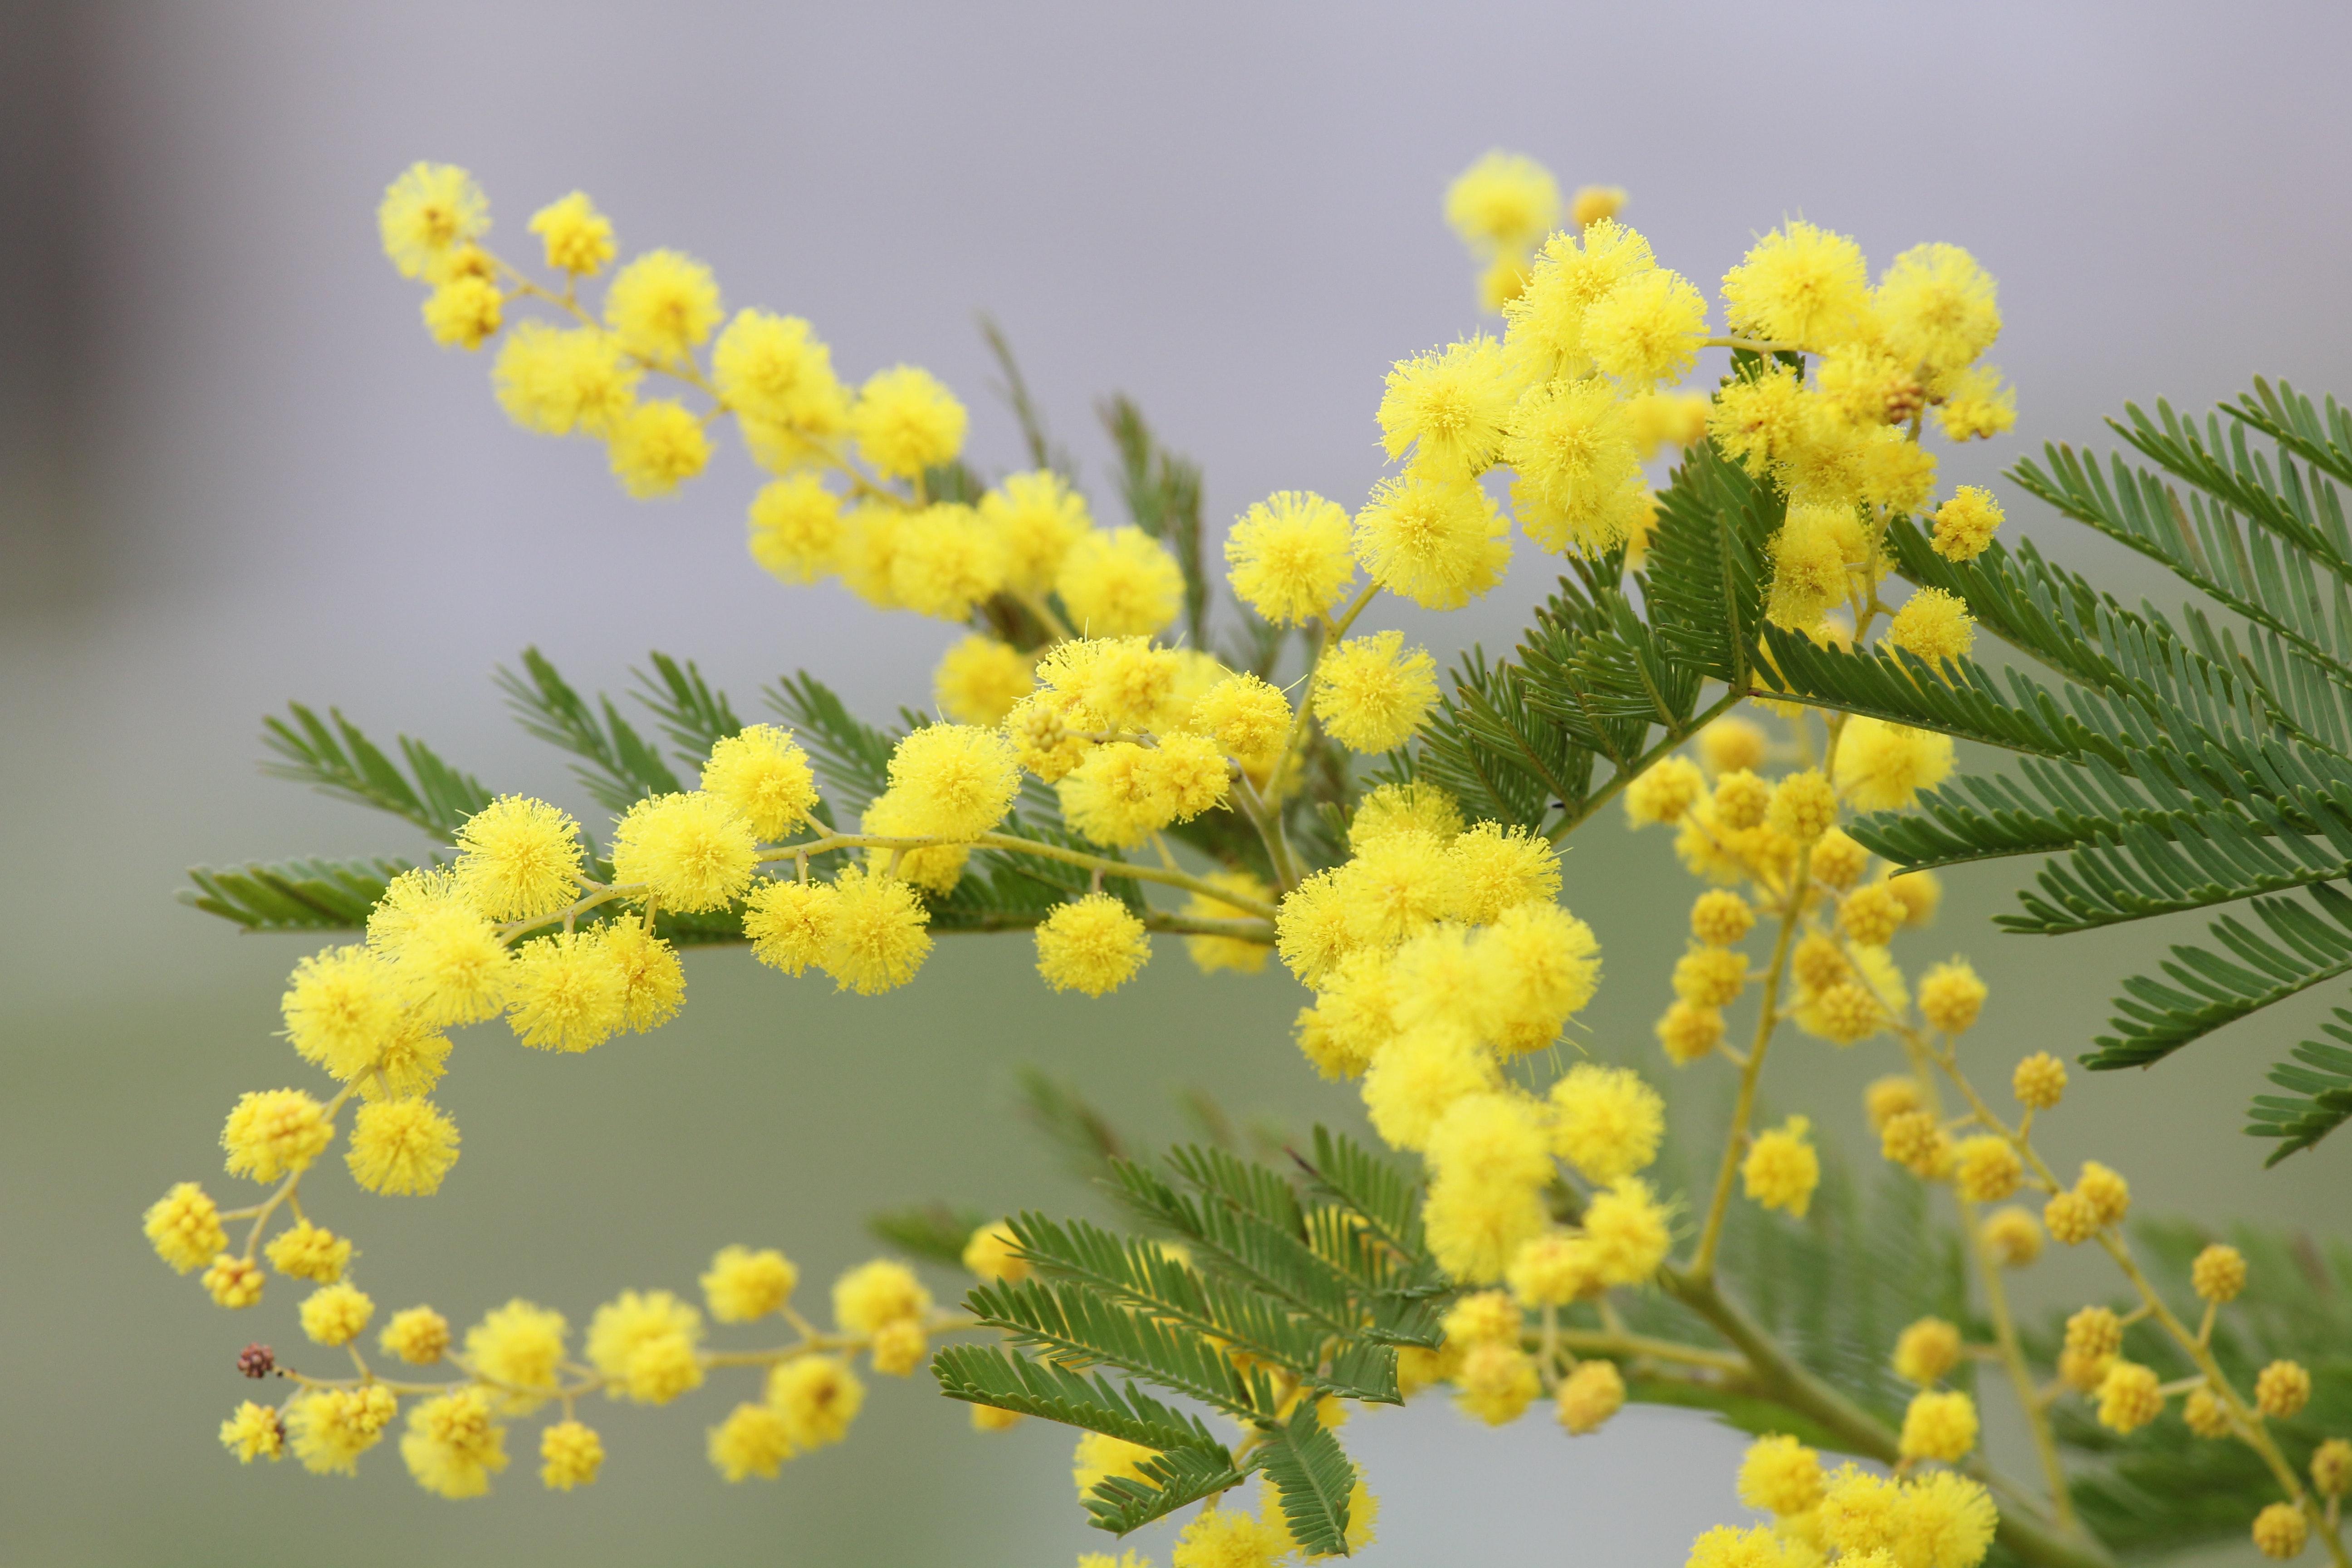 Yellow Mimosa Flowers Free Stock Photo